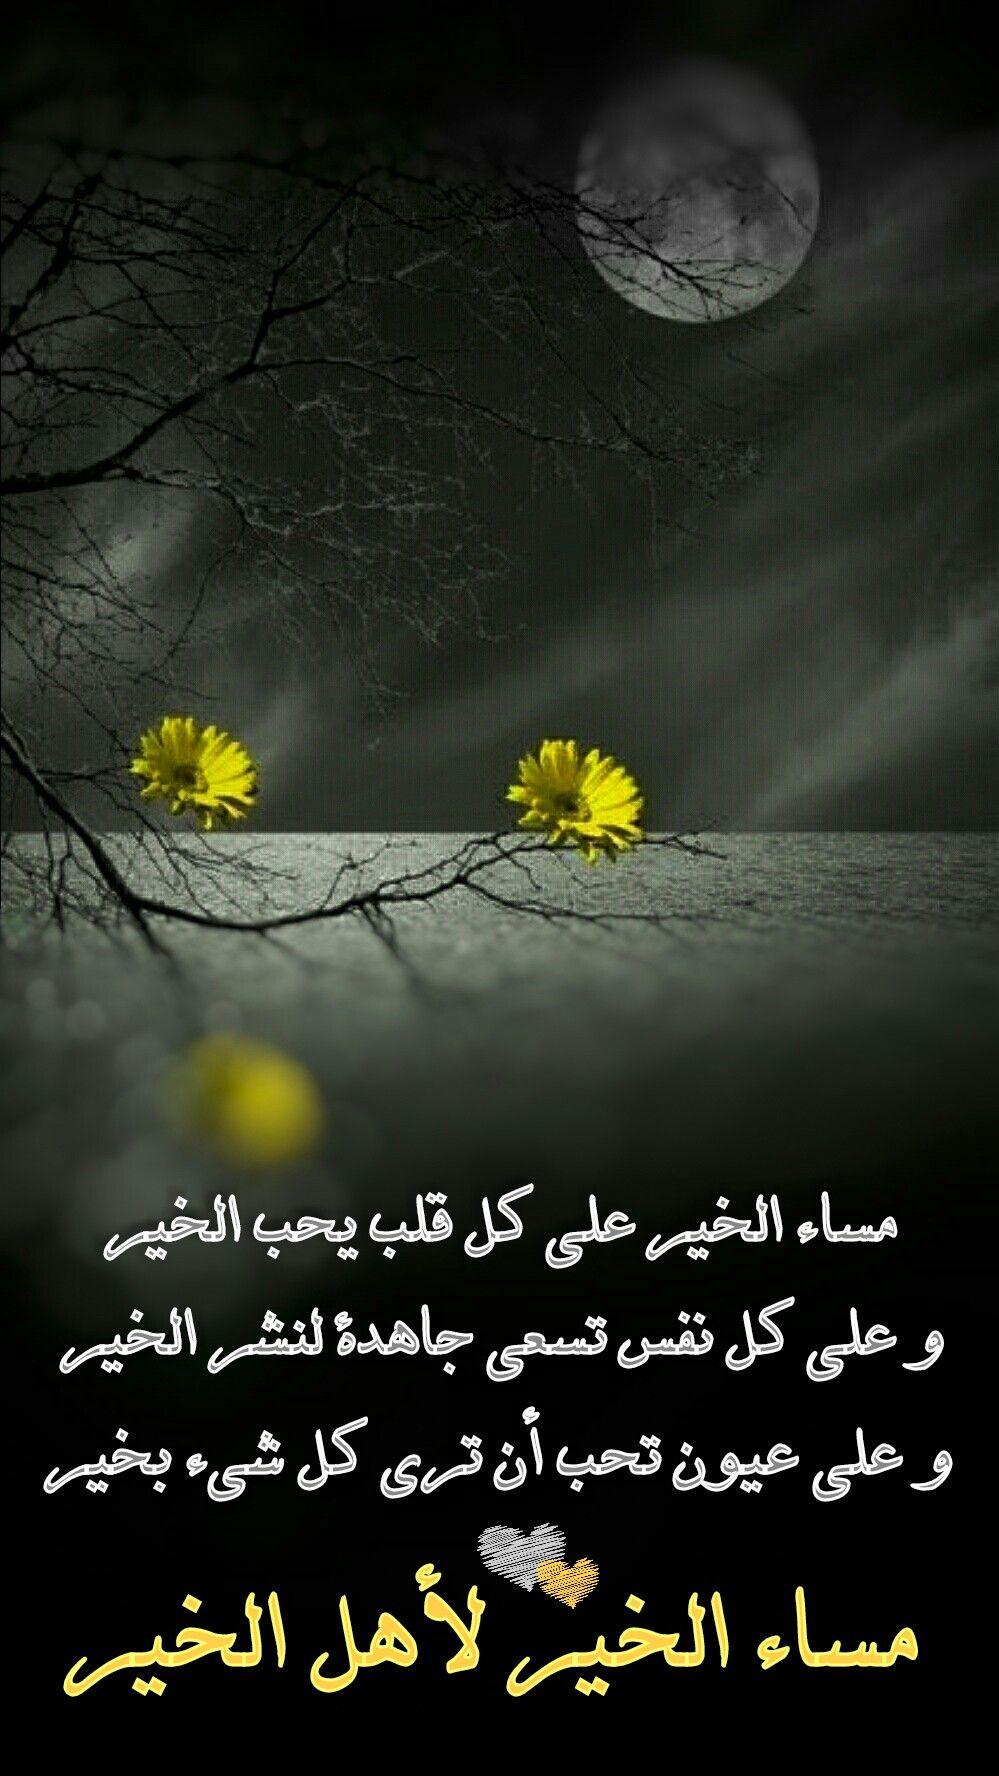 صور جميله Good Morning Beautiful Good Evening Good Morning Greetings